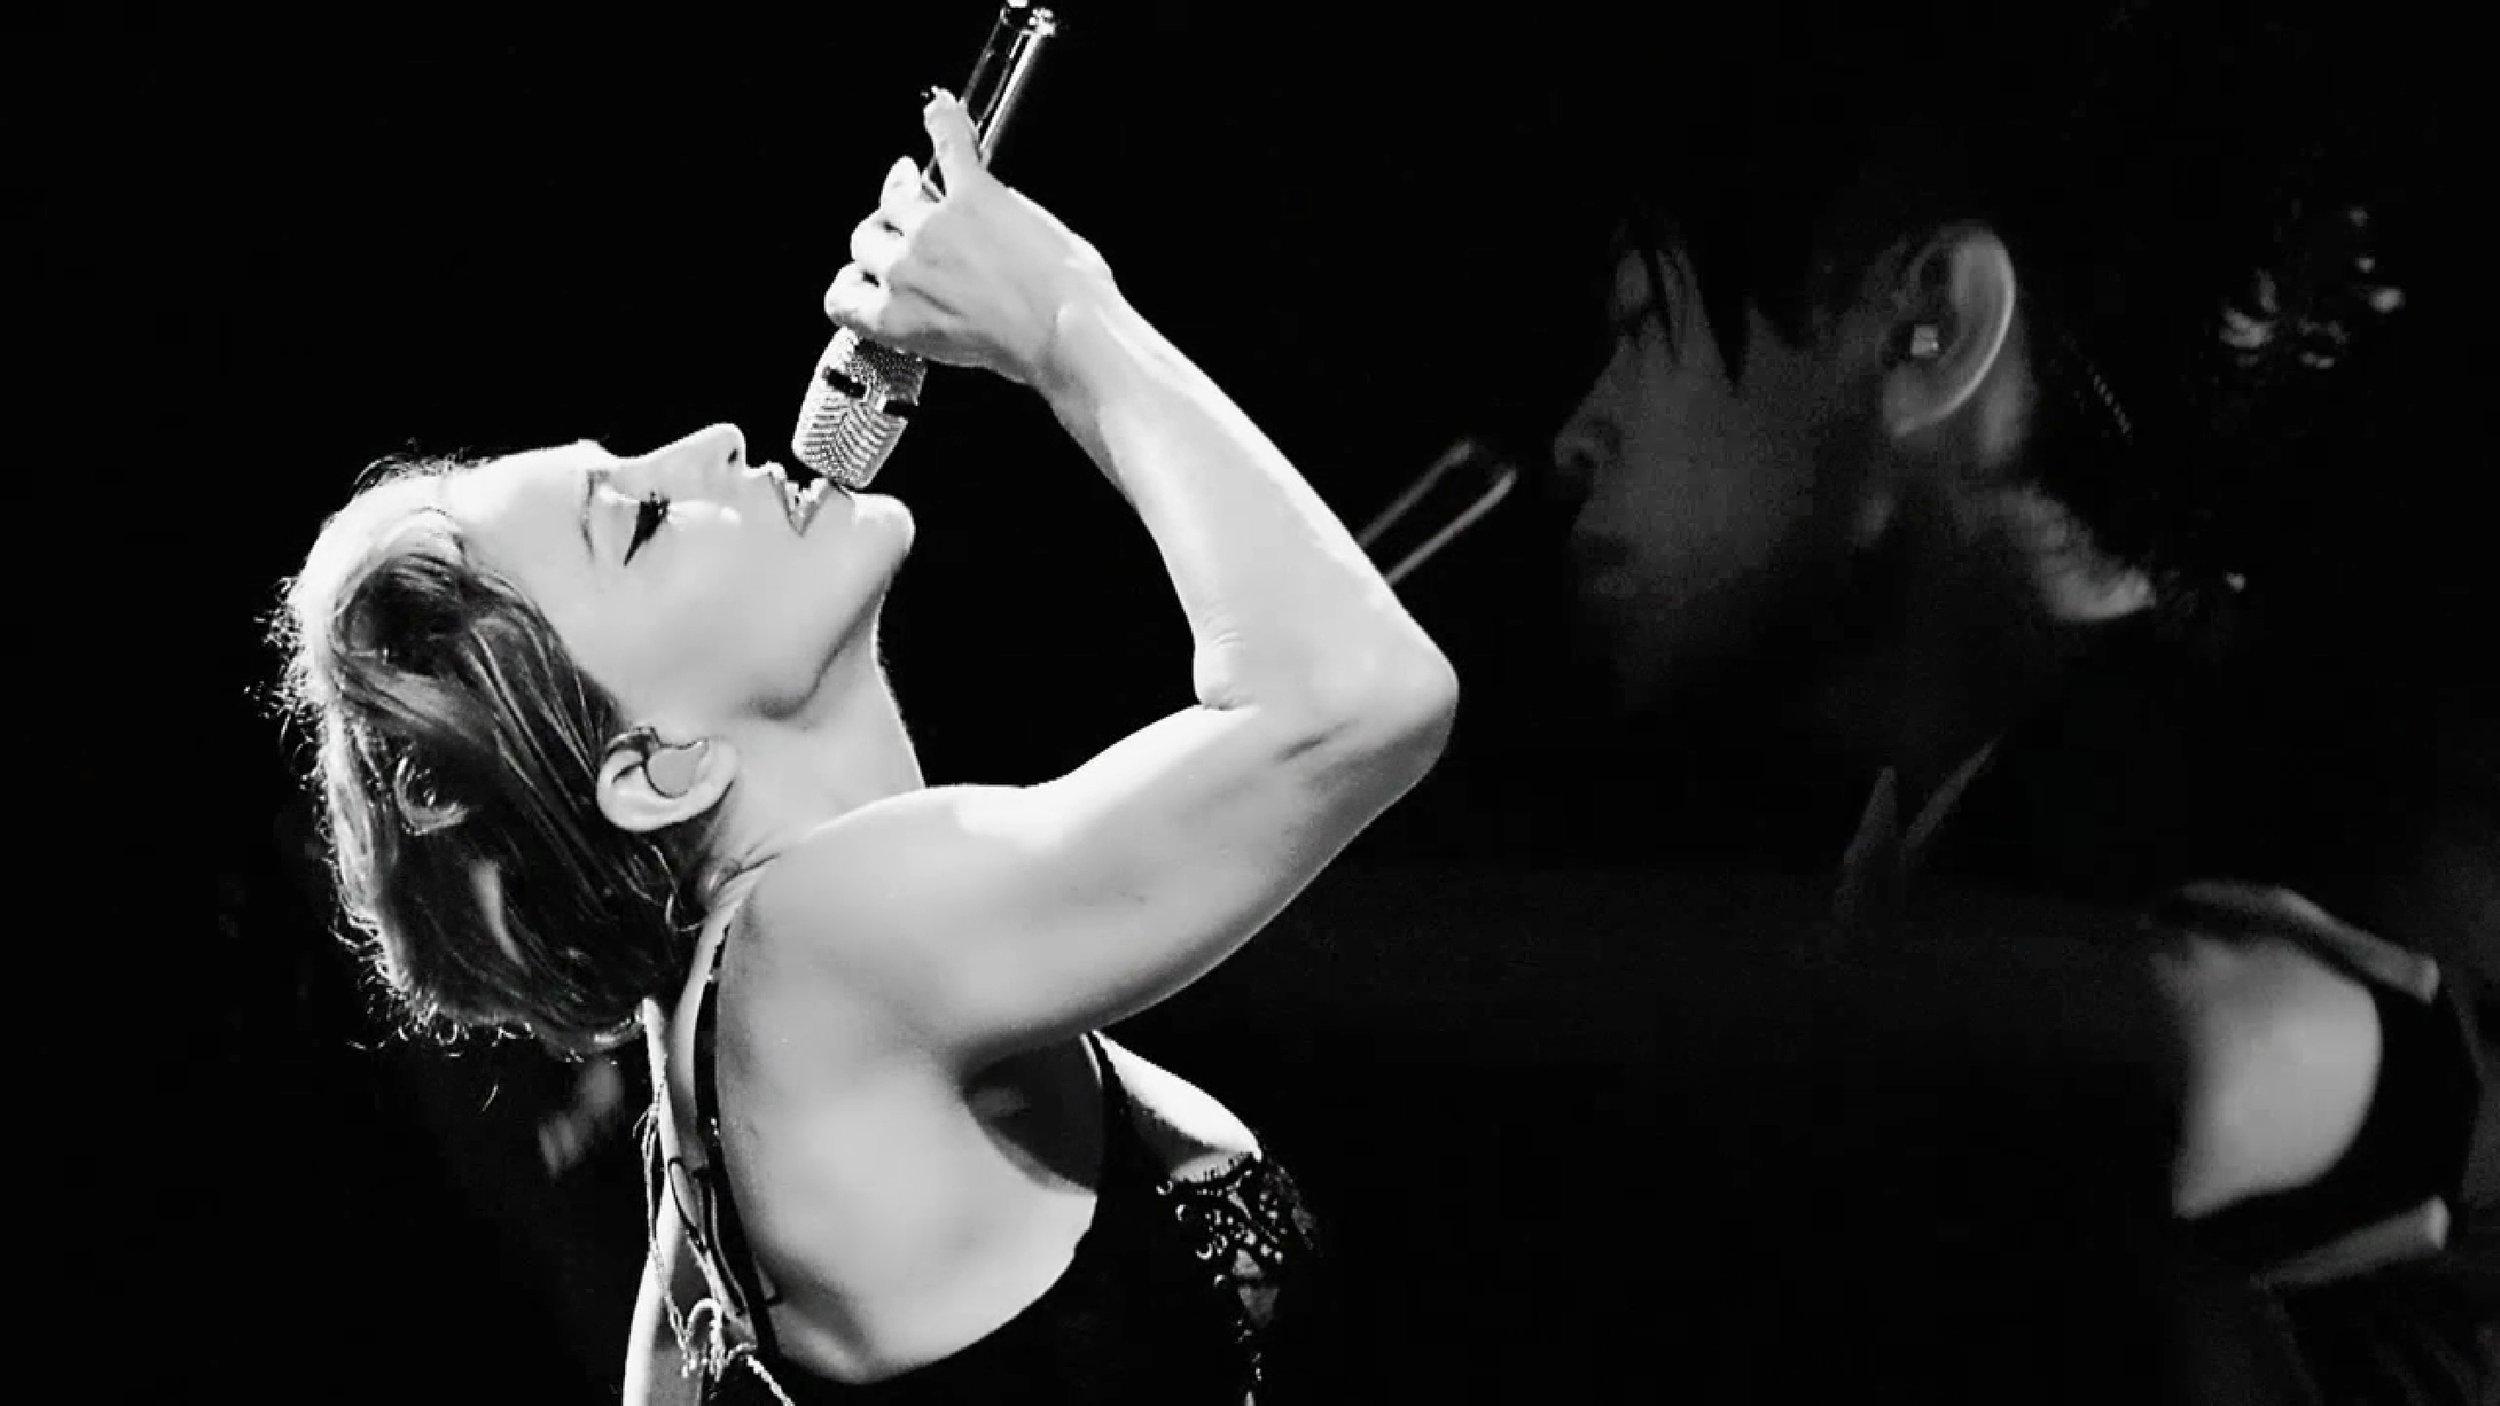 Jason Yang Madonna